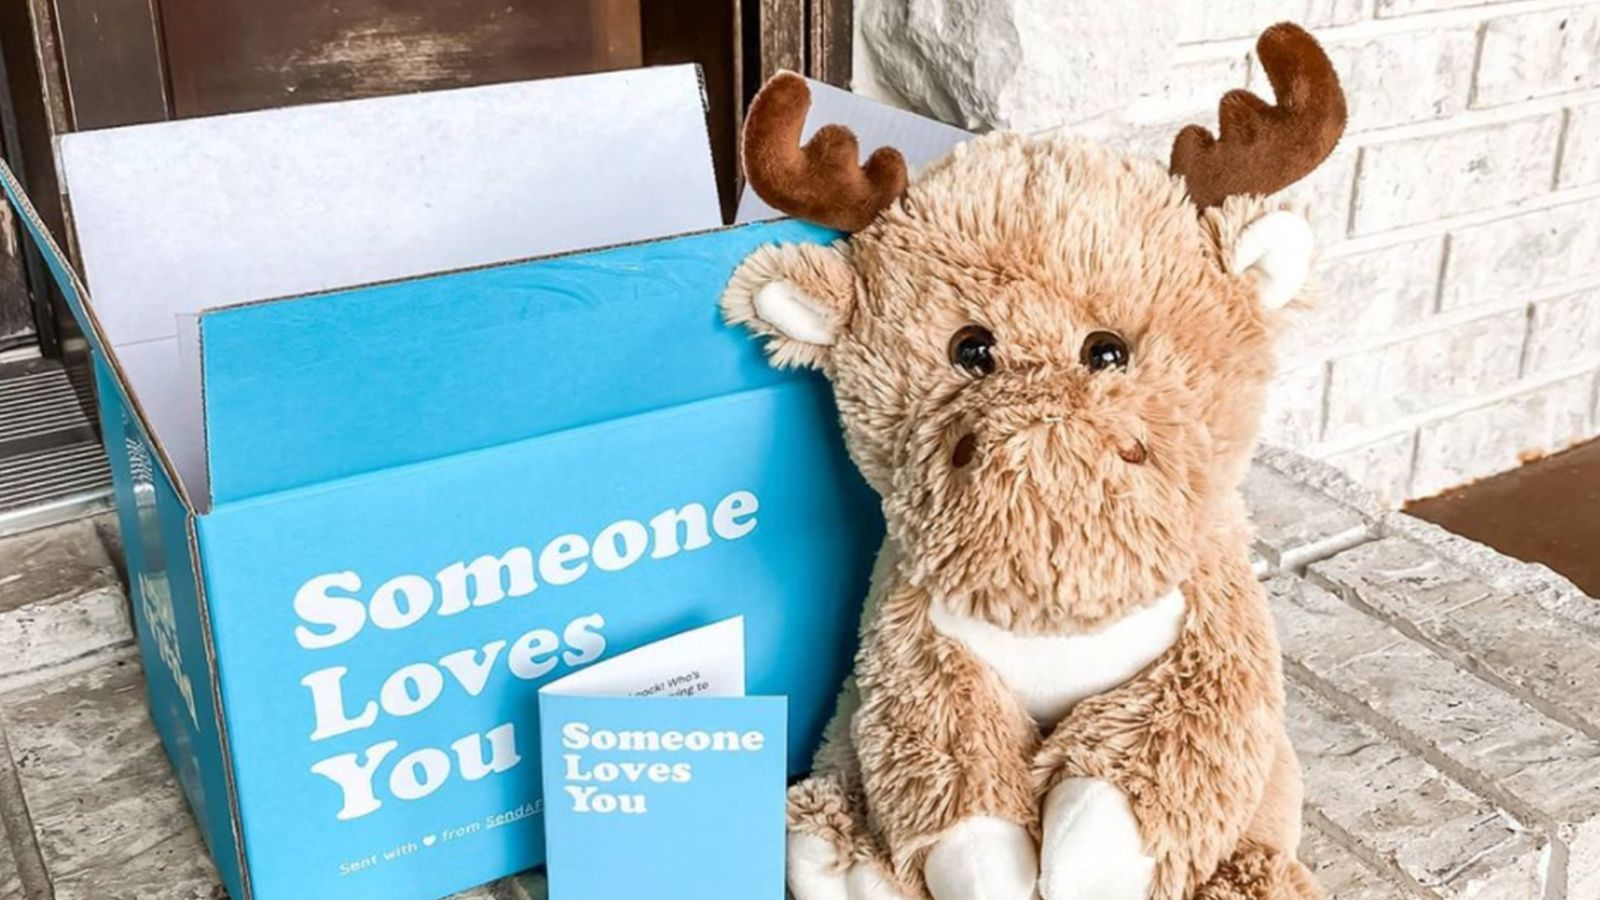 SendAFriend: Stuffed Animals For Social Good